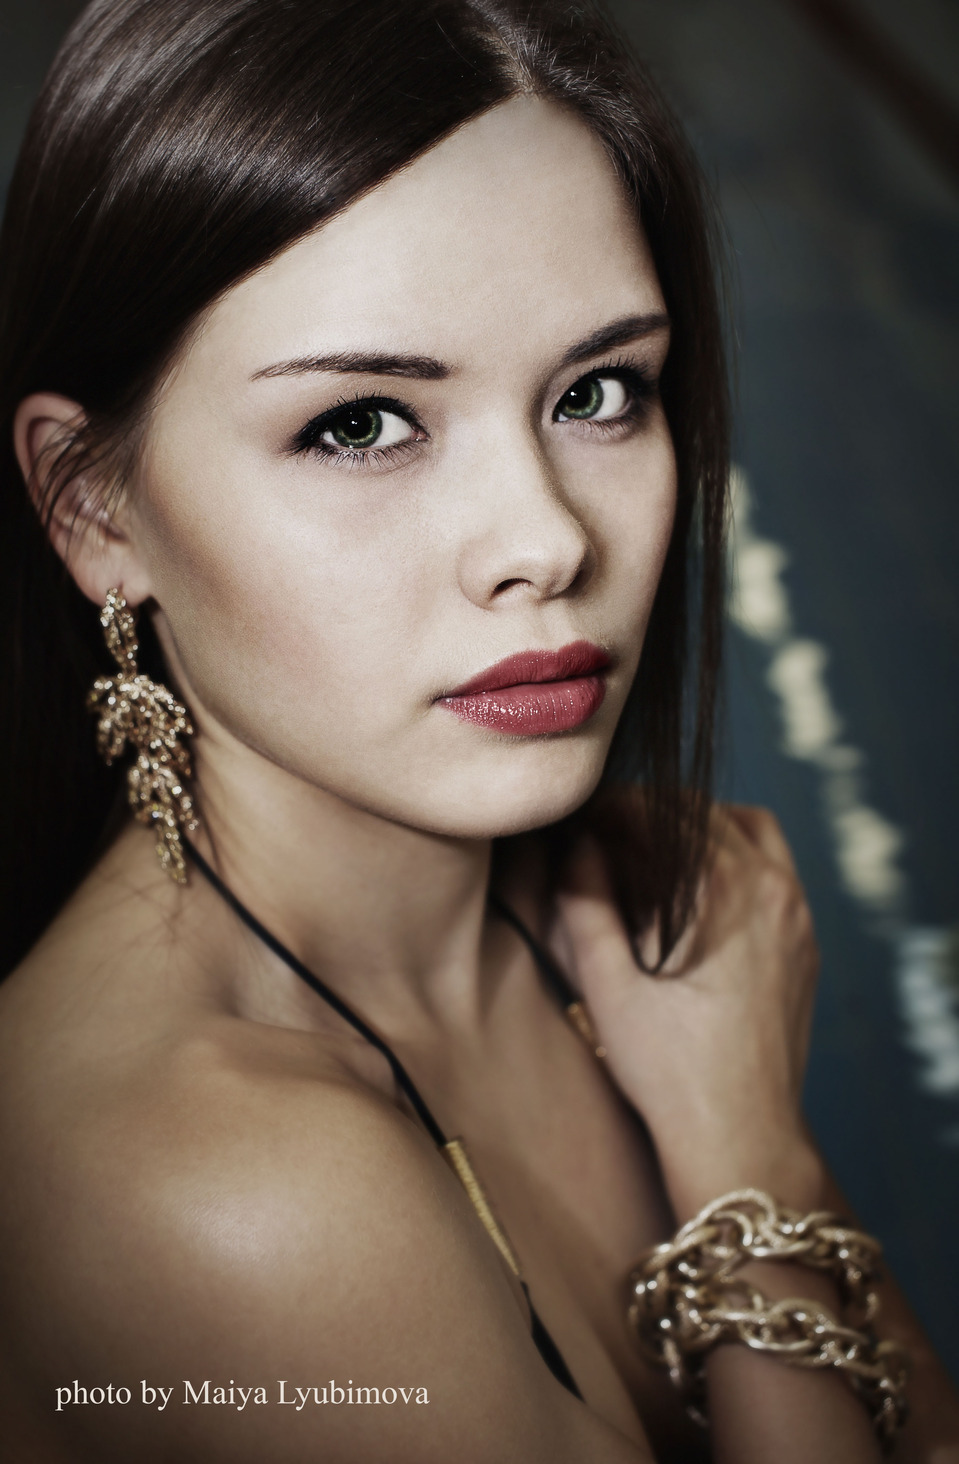 Beautiful girl with green eyes   portrait, model, girl, brunette, red lipstick, green eyes, perfect skin, ear-rings, bracelet, beautiful